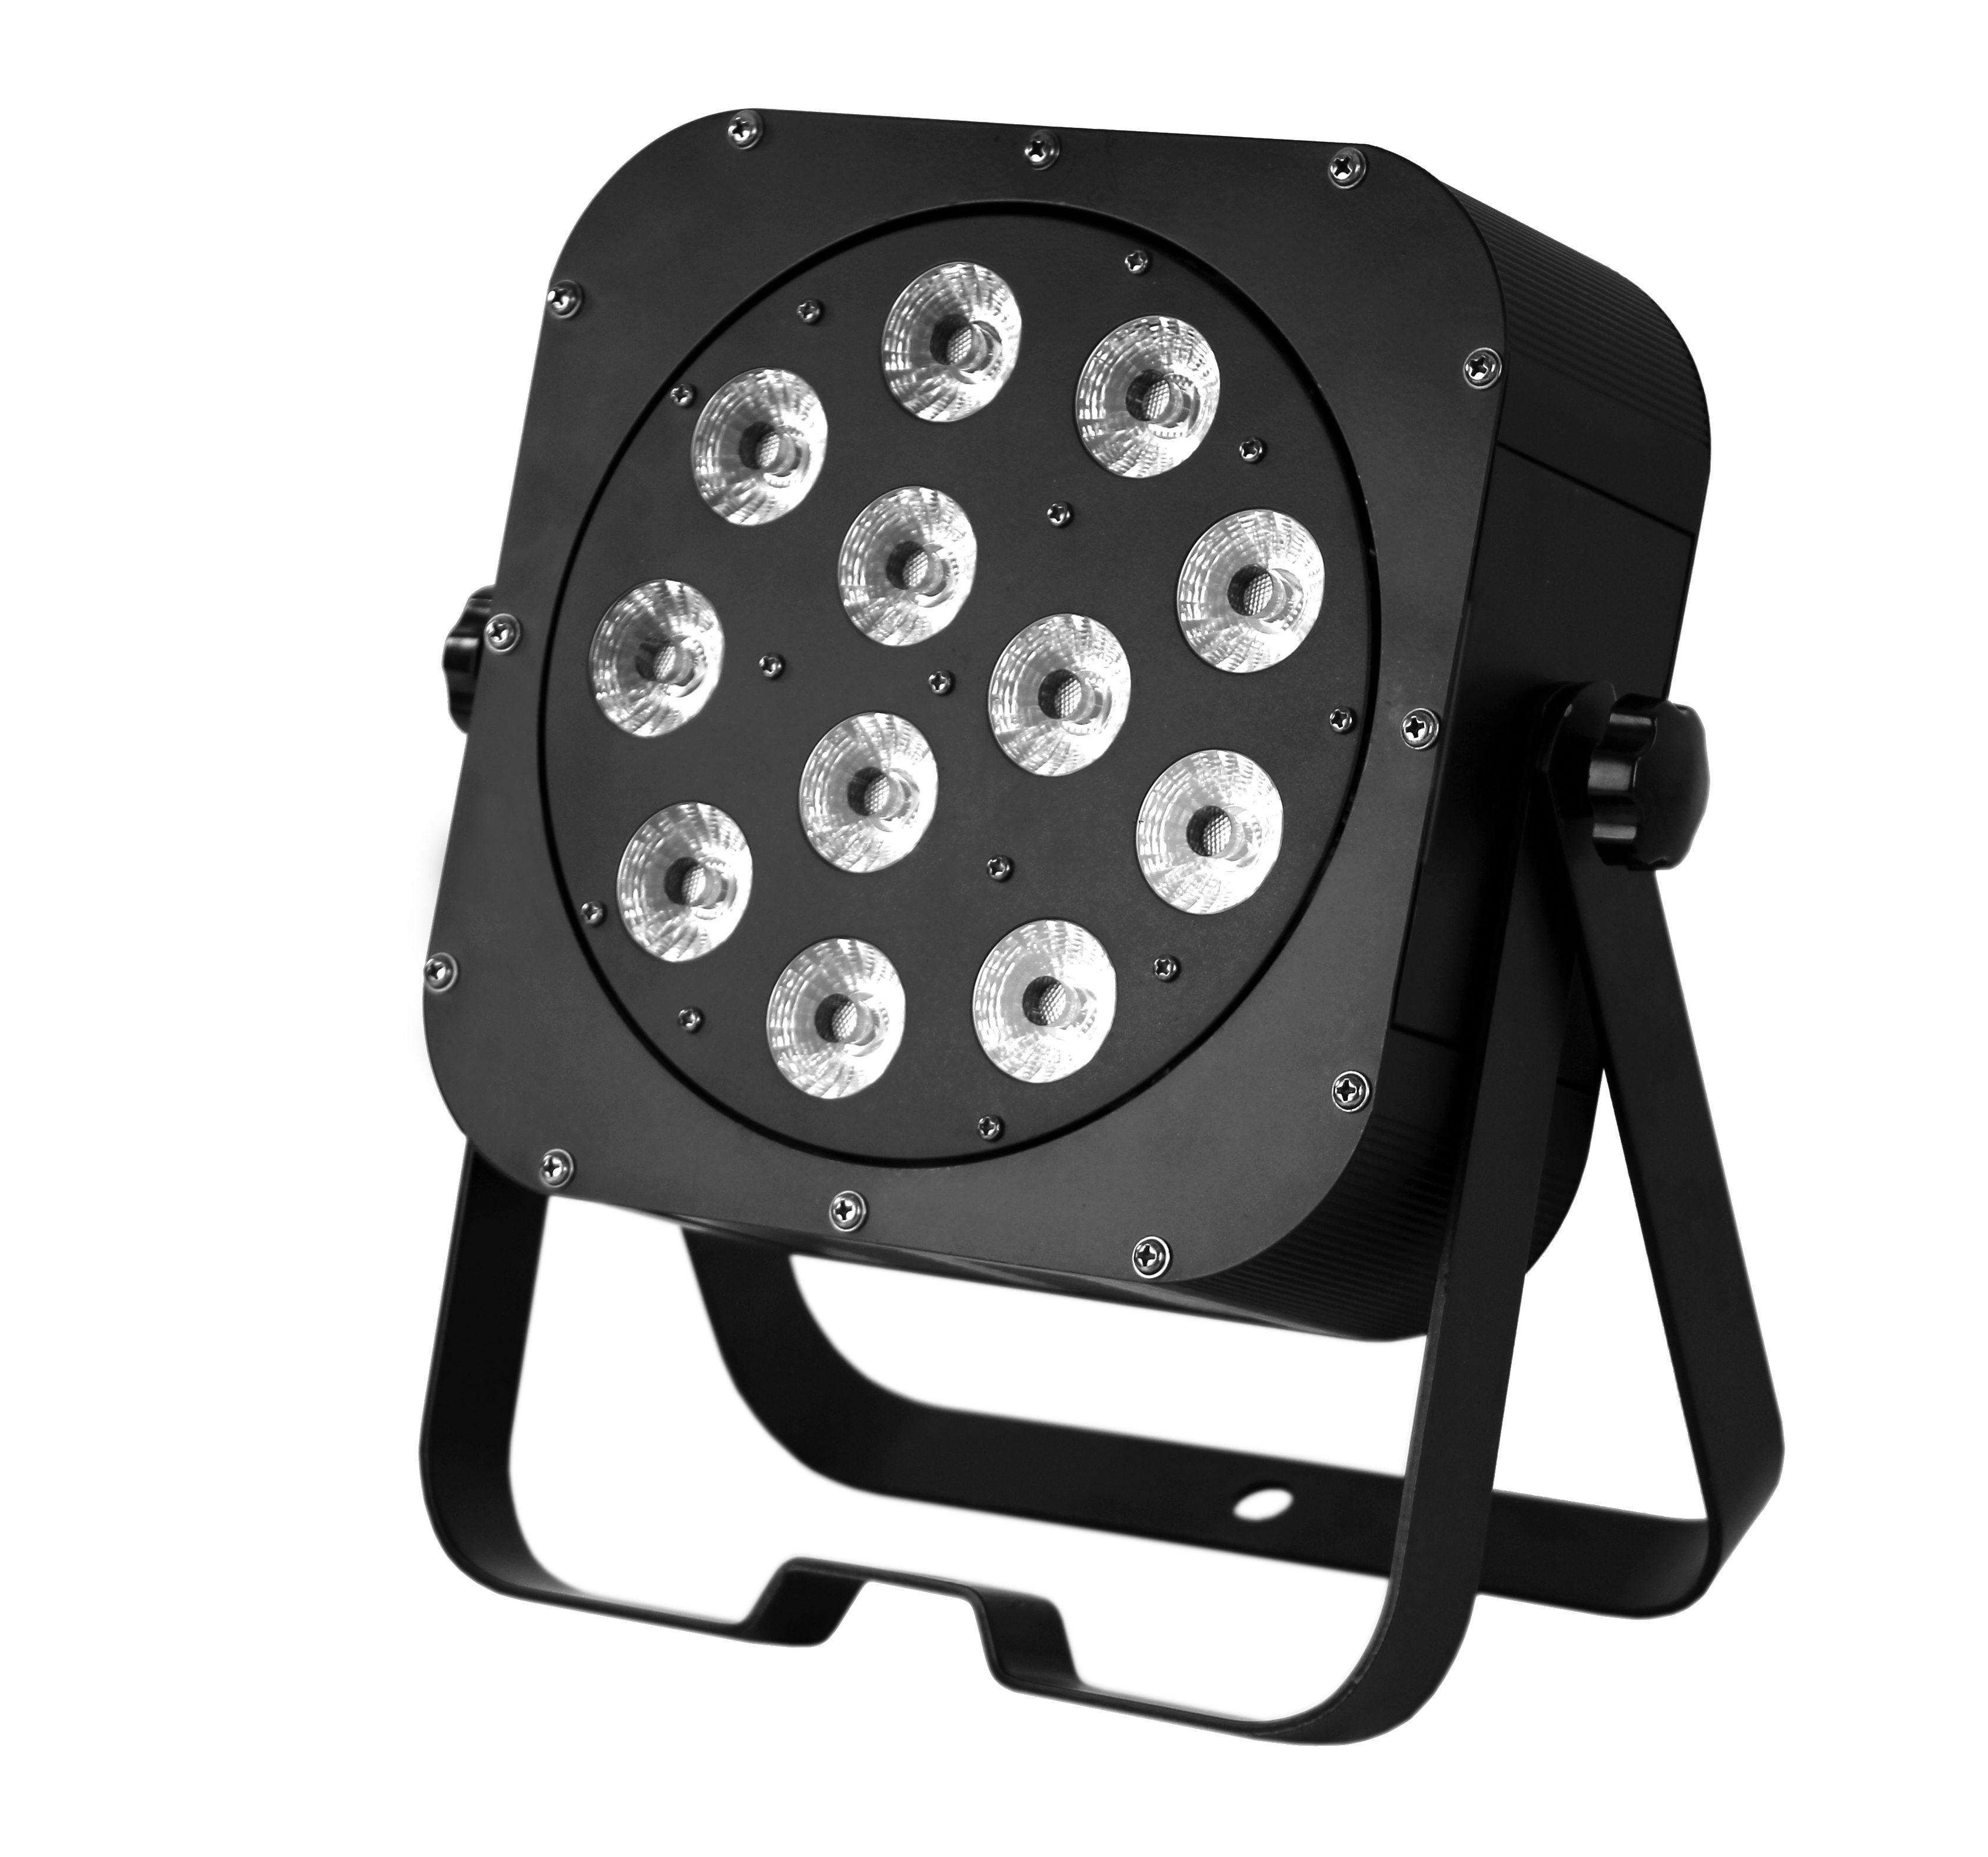 Involight LED Scheinwerfer - 6 Farben Multichip LED »SlimPAR126PRO«